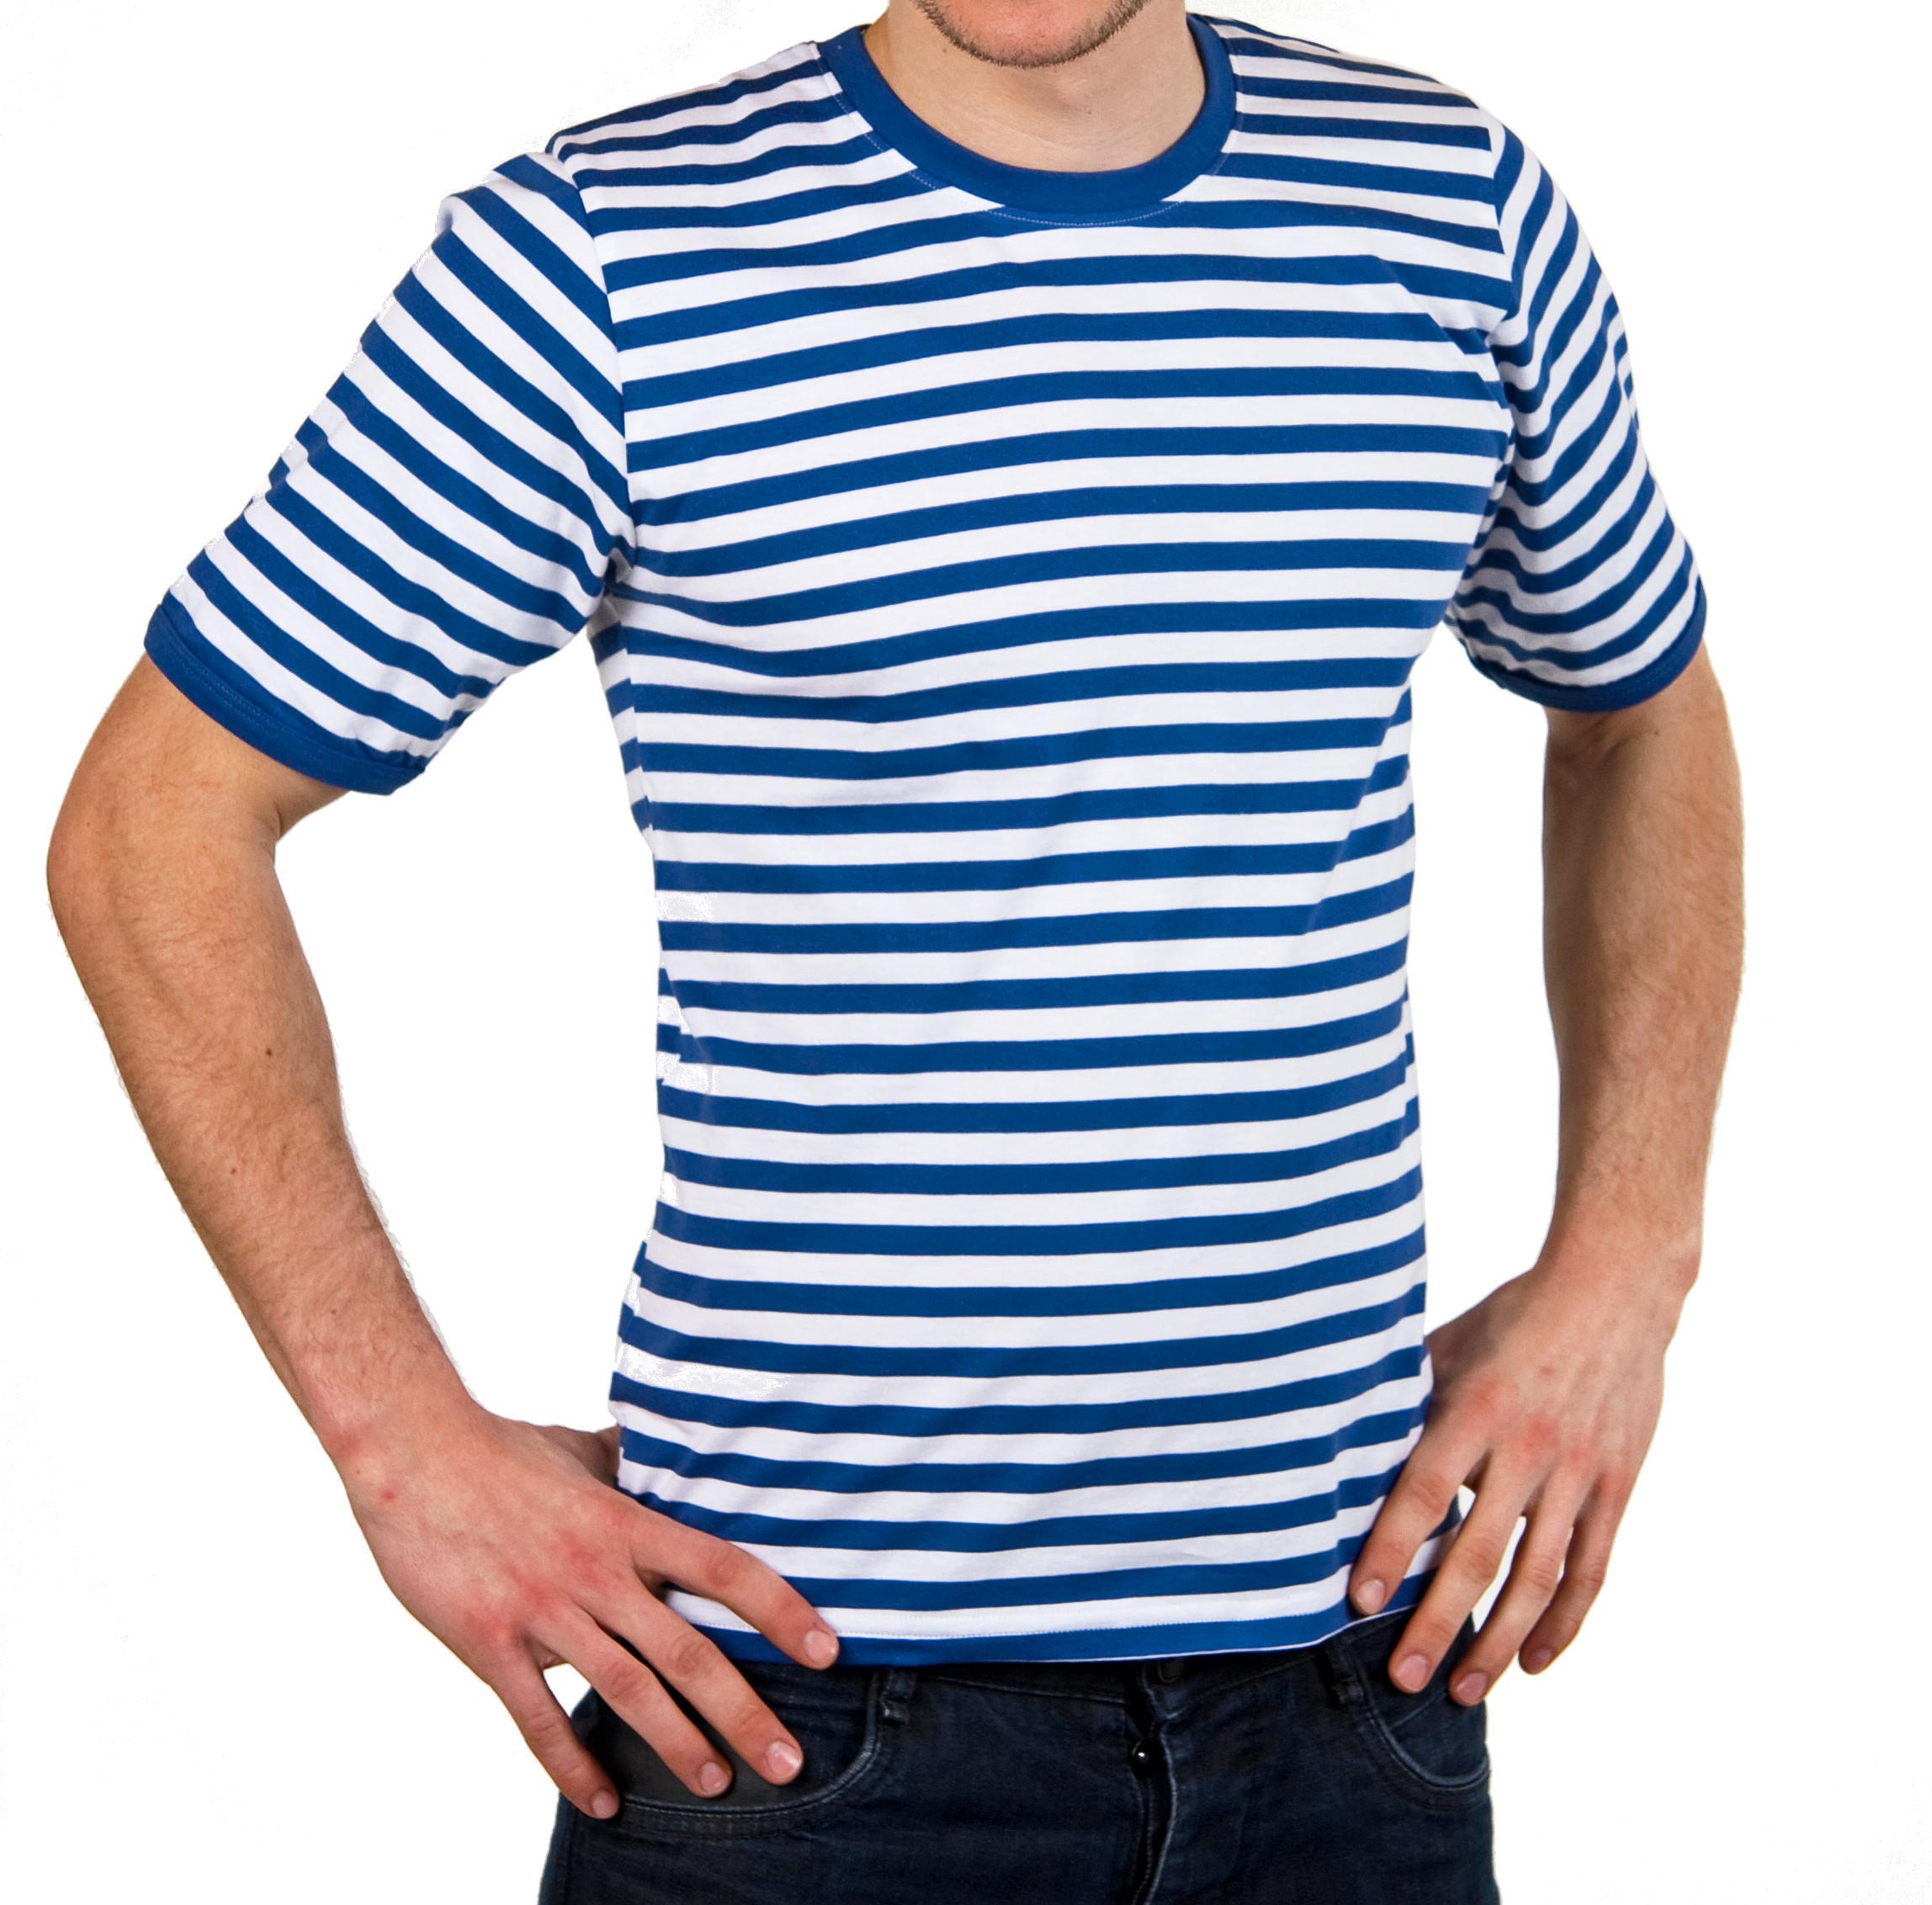 blau wei es halbarm ringelshirt gr xl ringelpulli matrose shirt. Black Bedroom Furniture Sets. Home Design Ideas